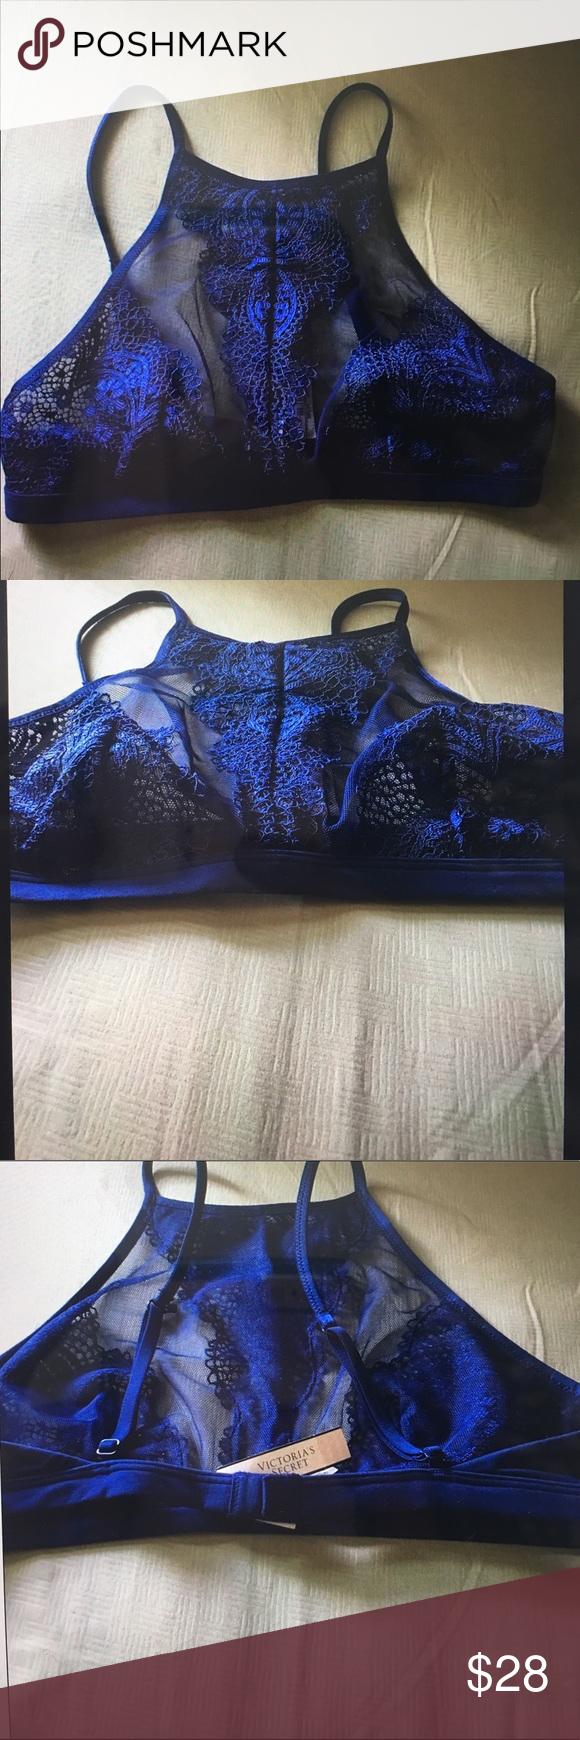 Victoria's Secret Lace Halter Bralette Brand new-- never used-- includes tags Victoria's Secret Tops